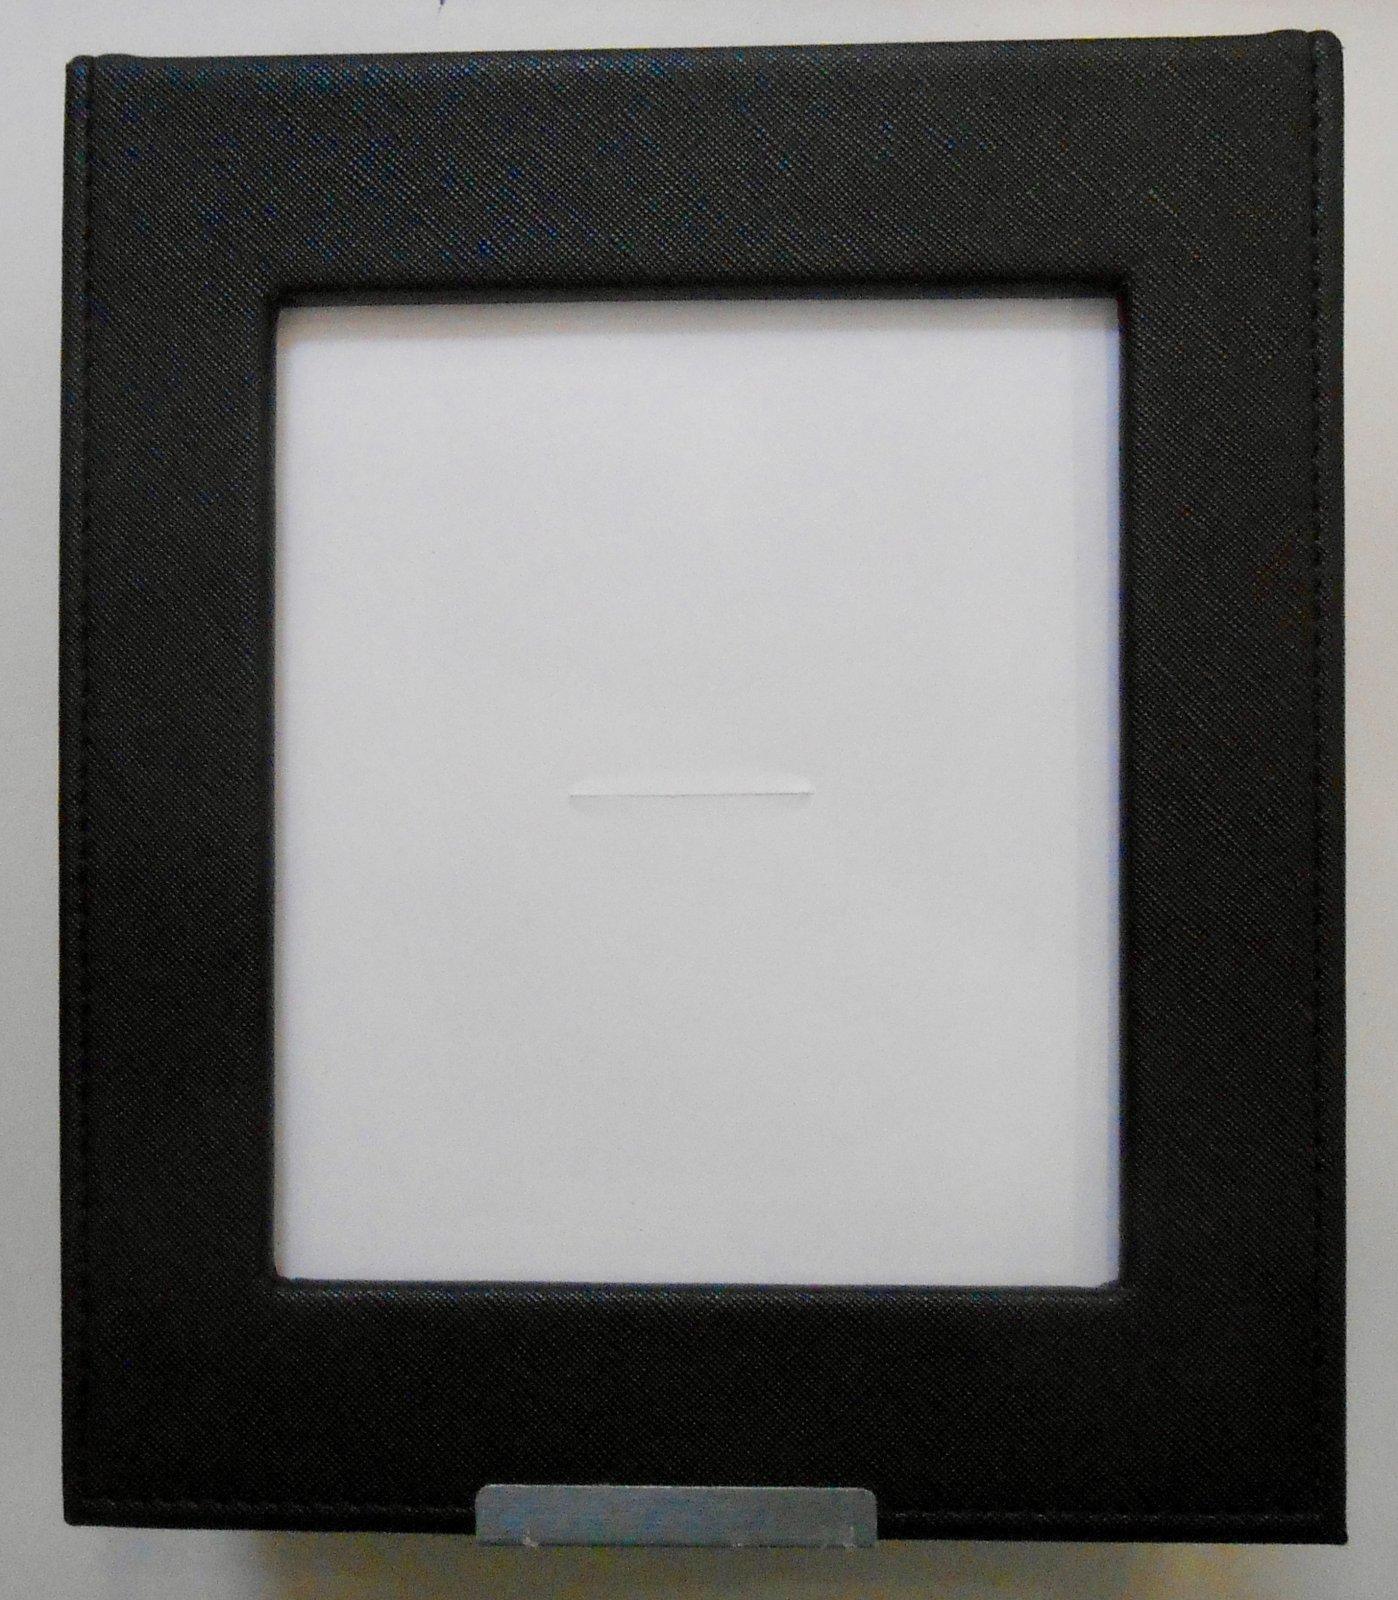 Black Display Box